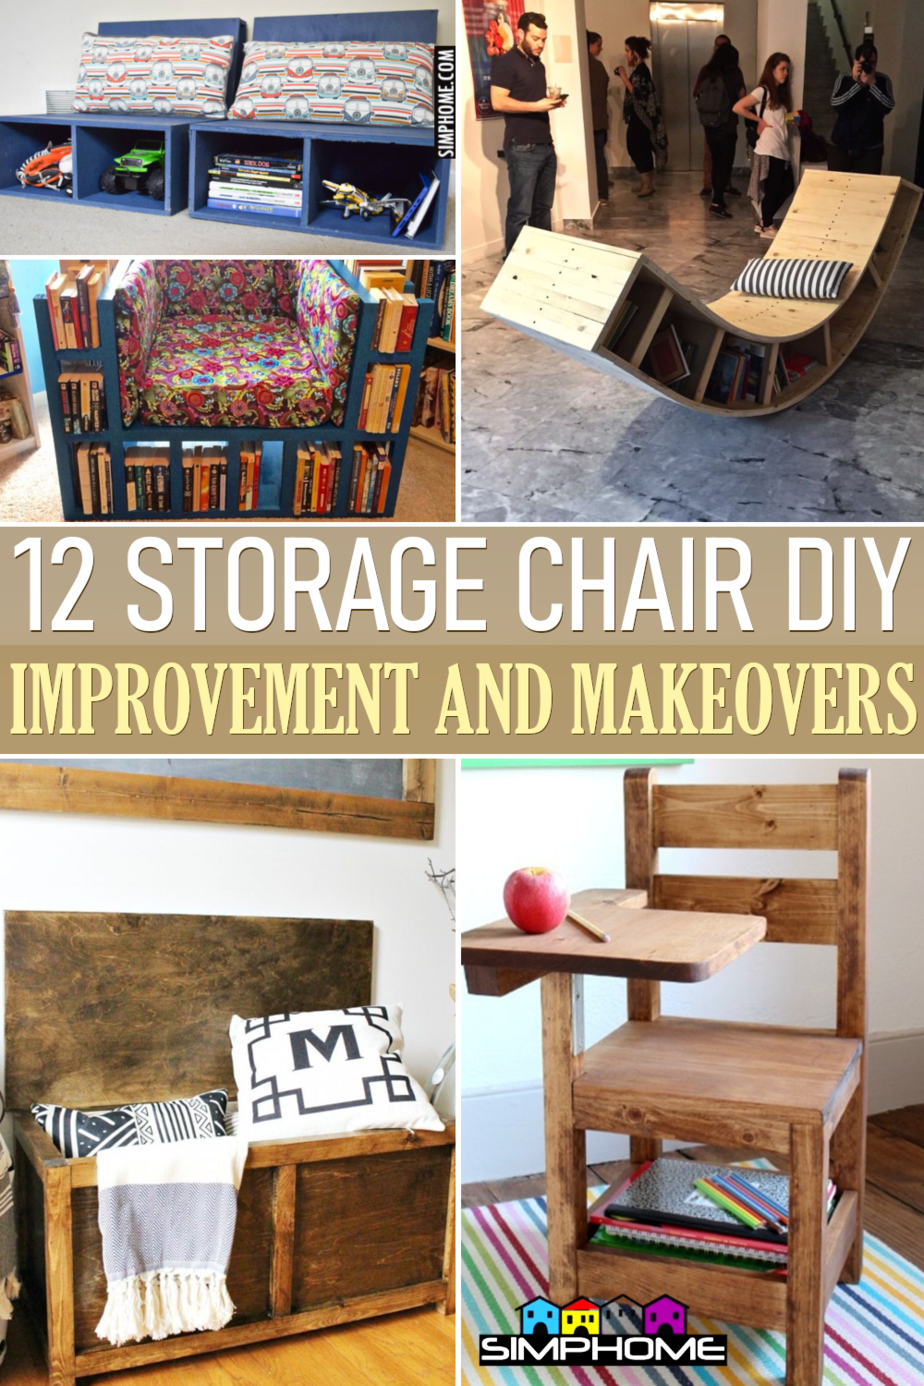 12 Storage Chair DIY Ideas via Simphome.comFeatured